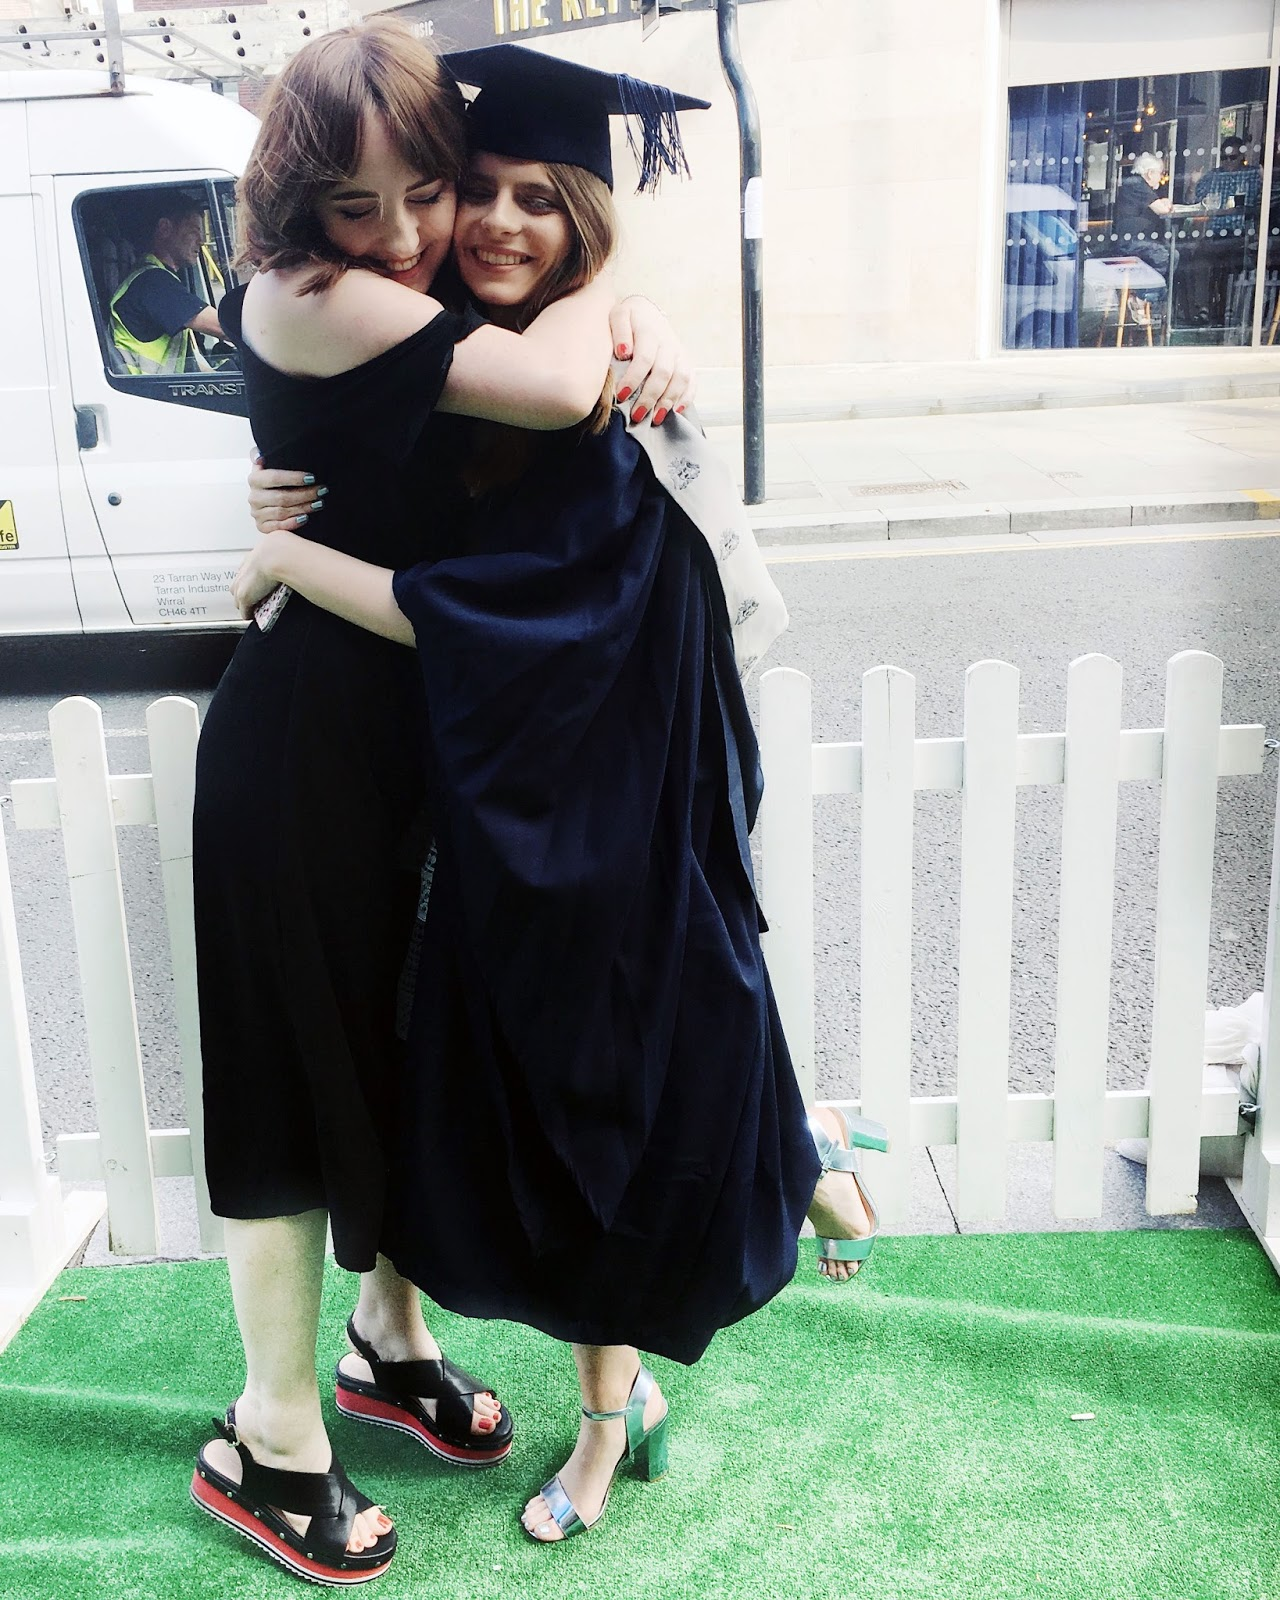 best friends graduation